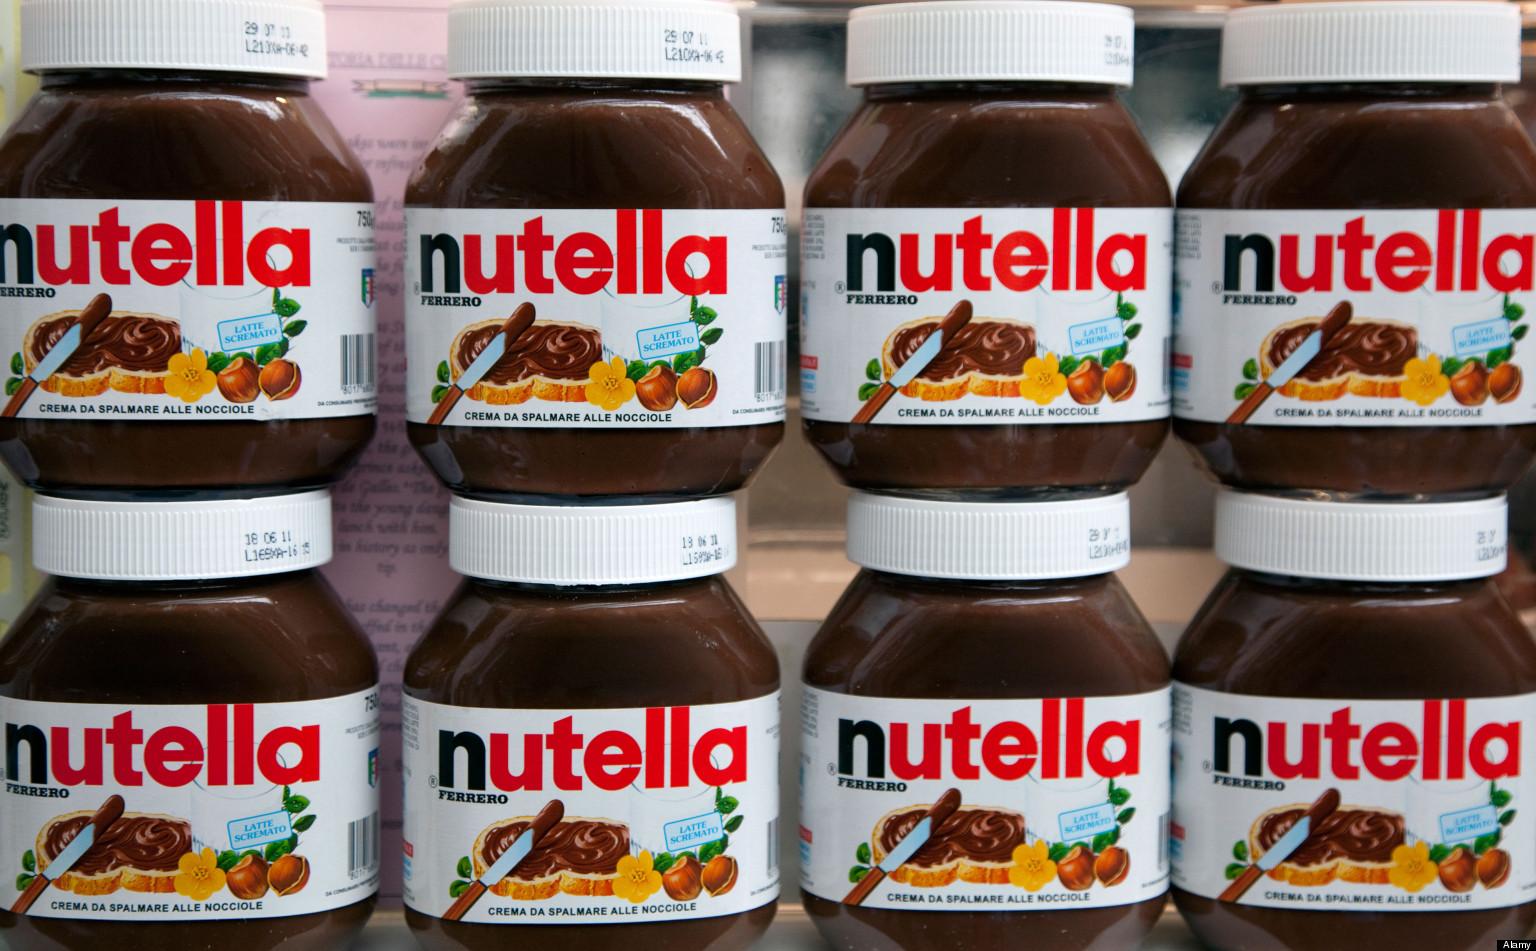 La Dolce Vita Italian food & drink show at Business Design Centre, London: Nutella chocolate spread